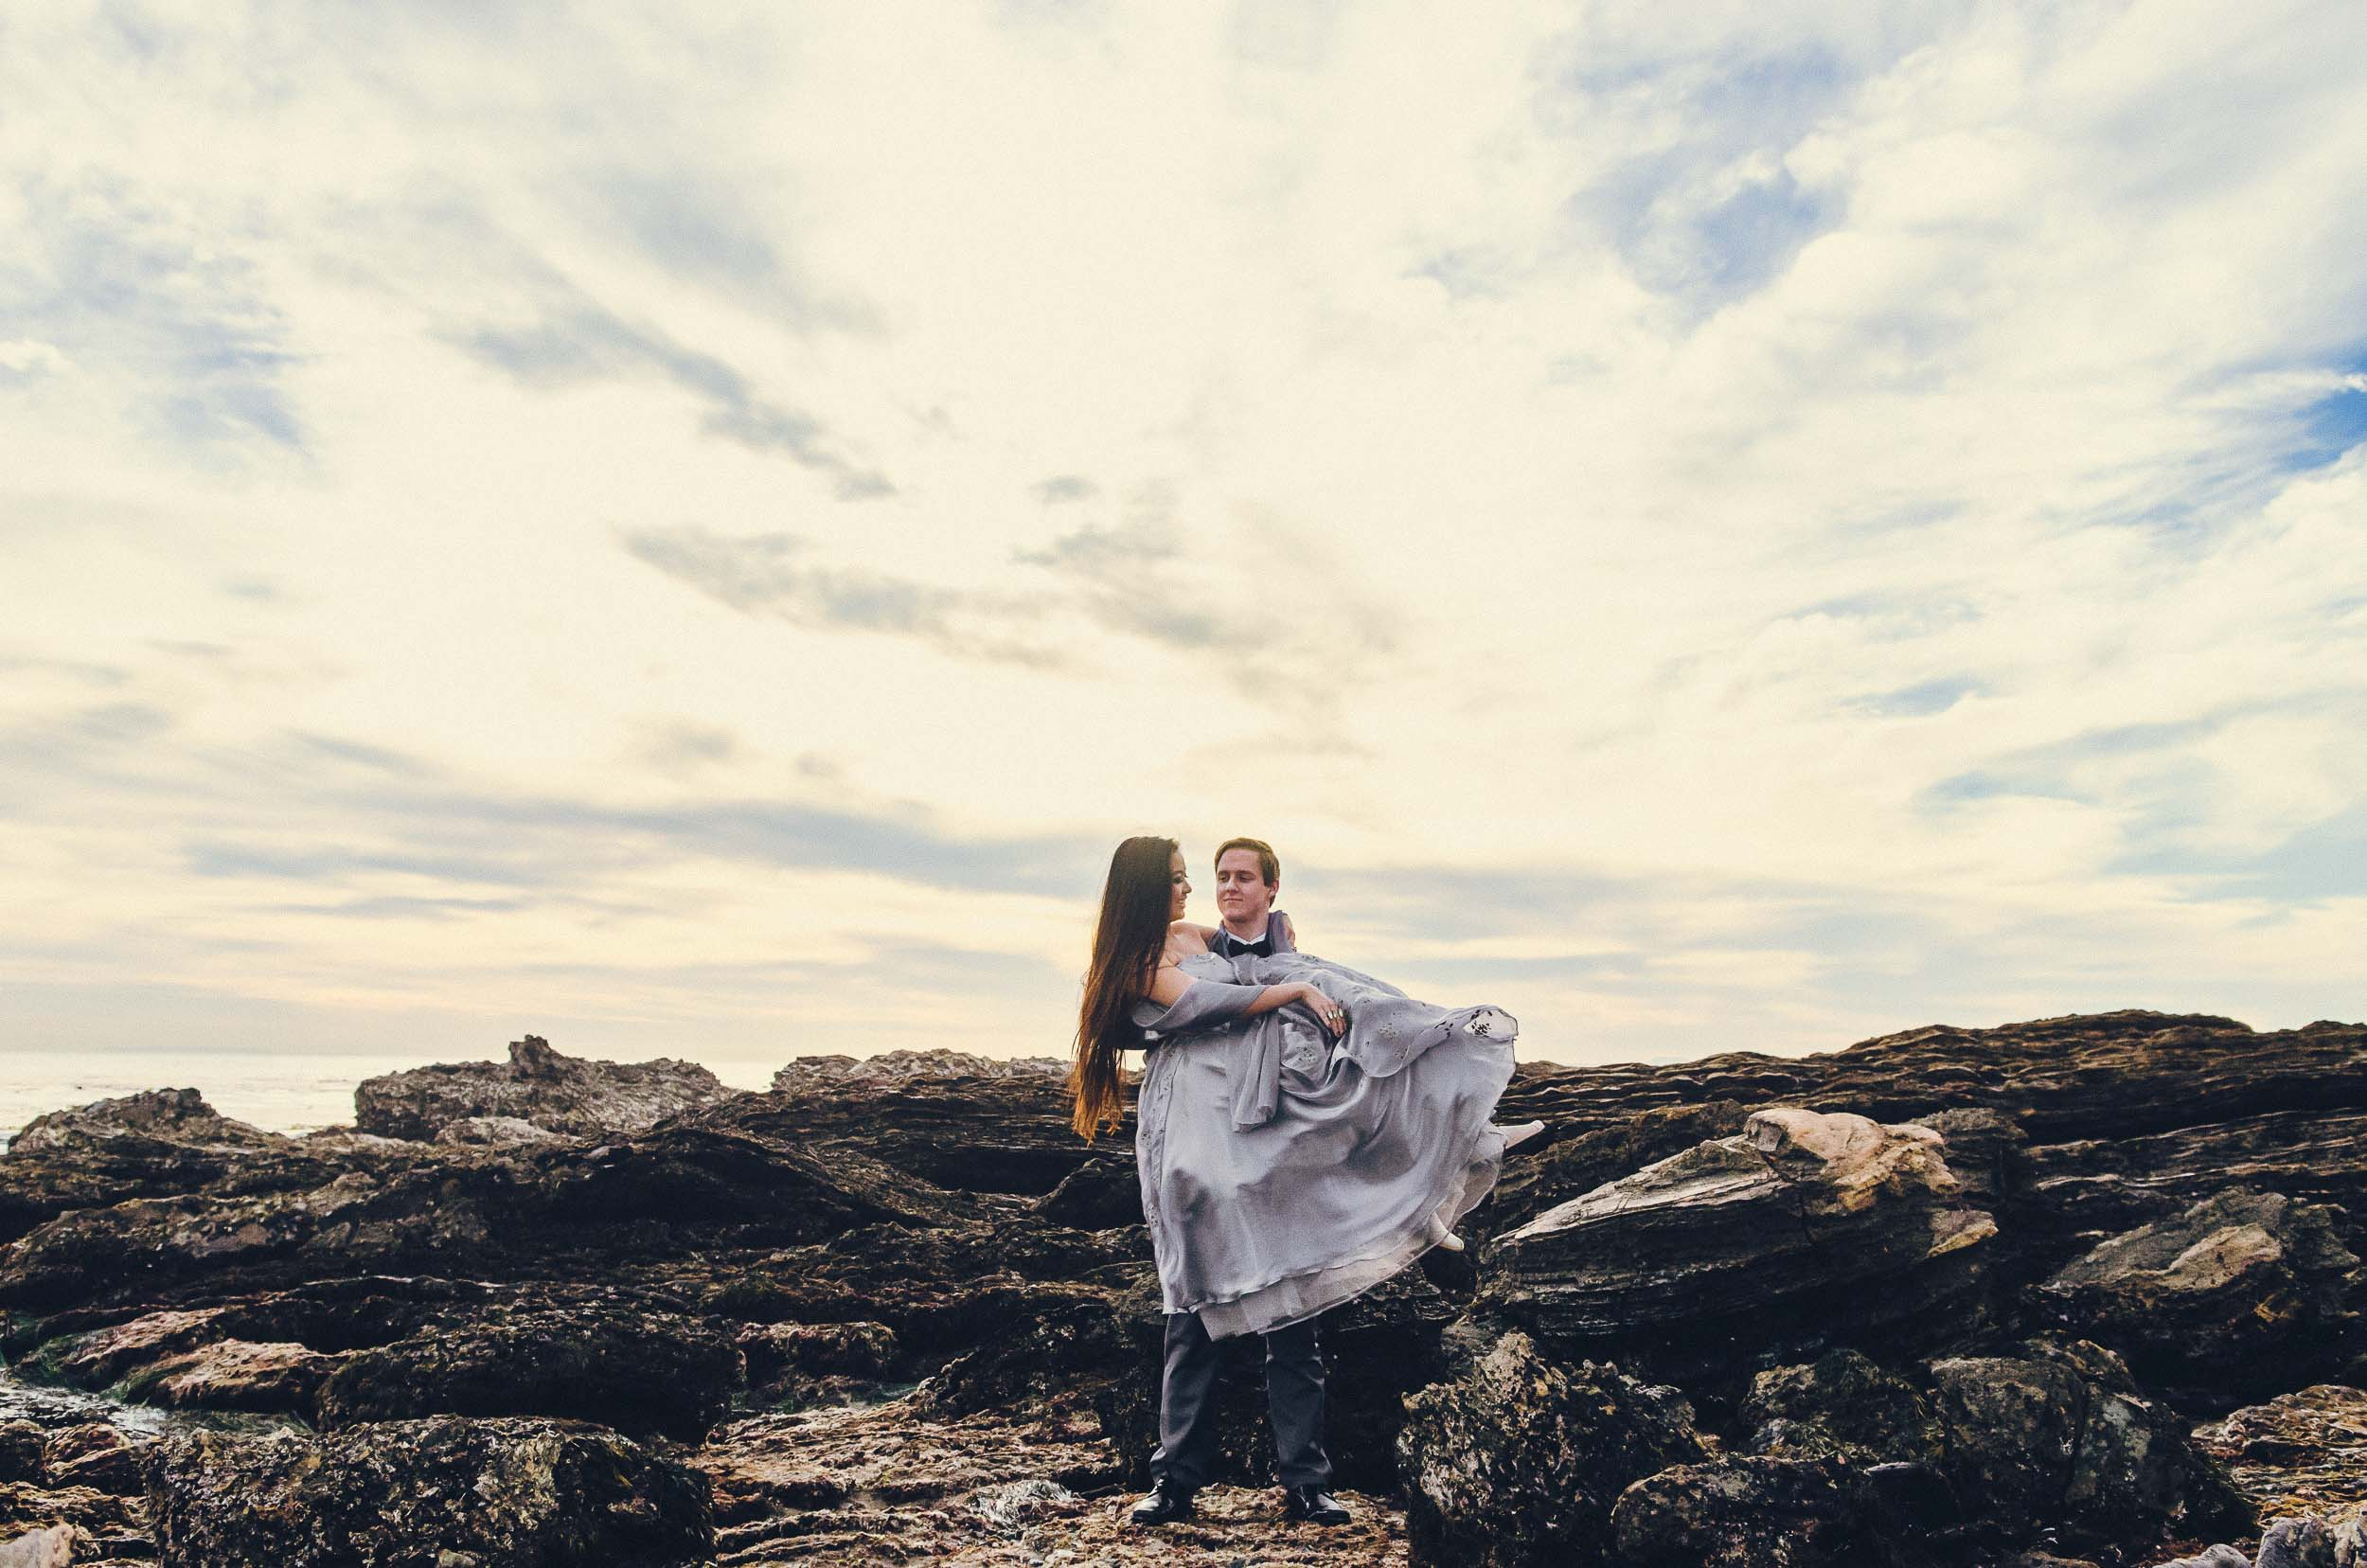 Bryan-Miraflor-Photography-Jackie-Ryan-Beach-Couple-Photoshoot-20131215-0032-1.jpg